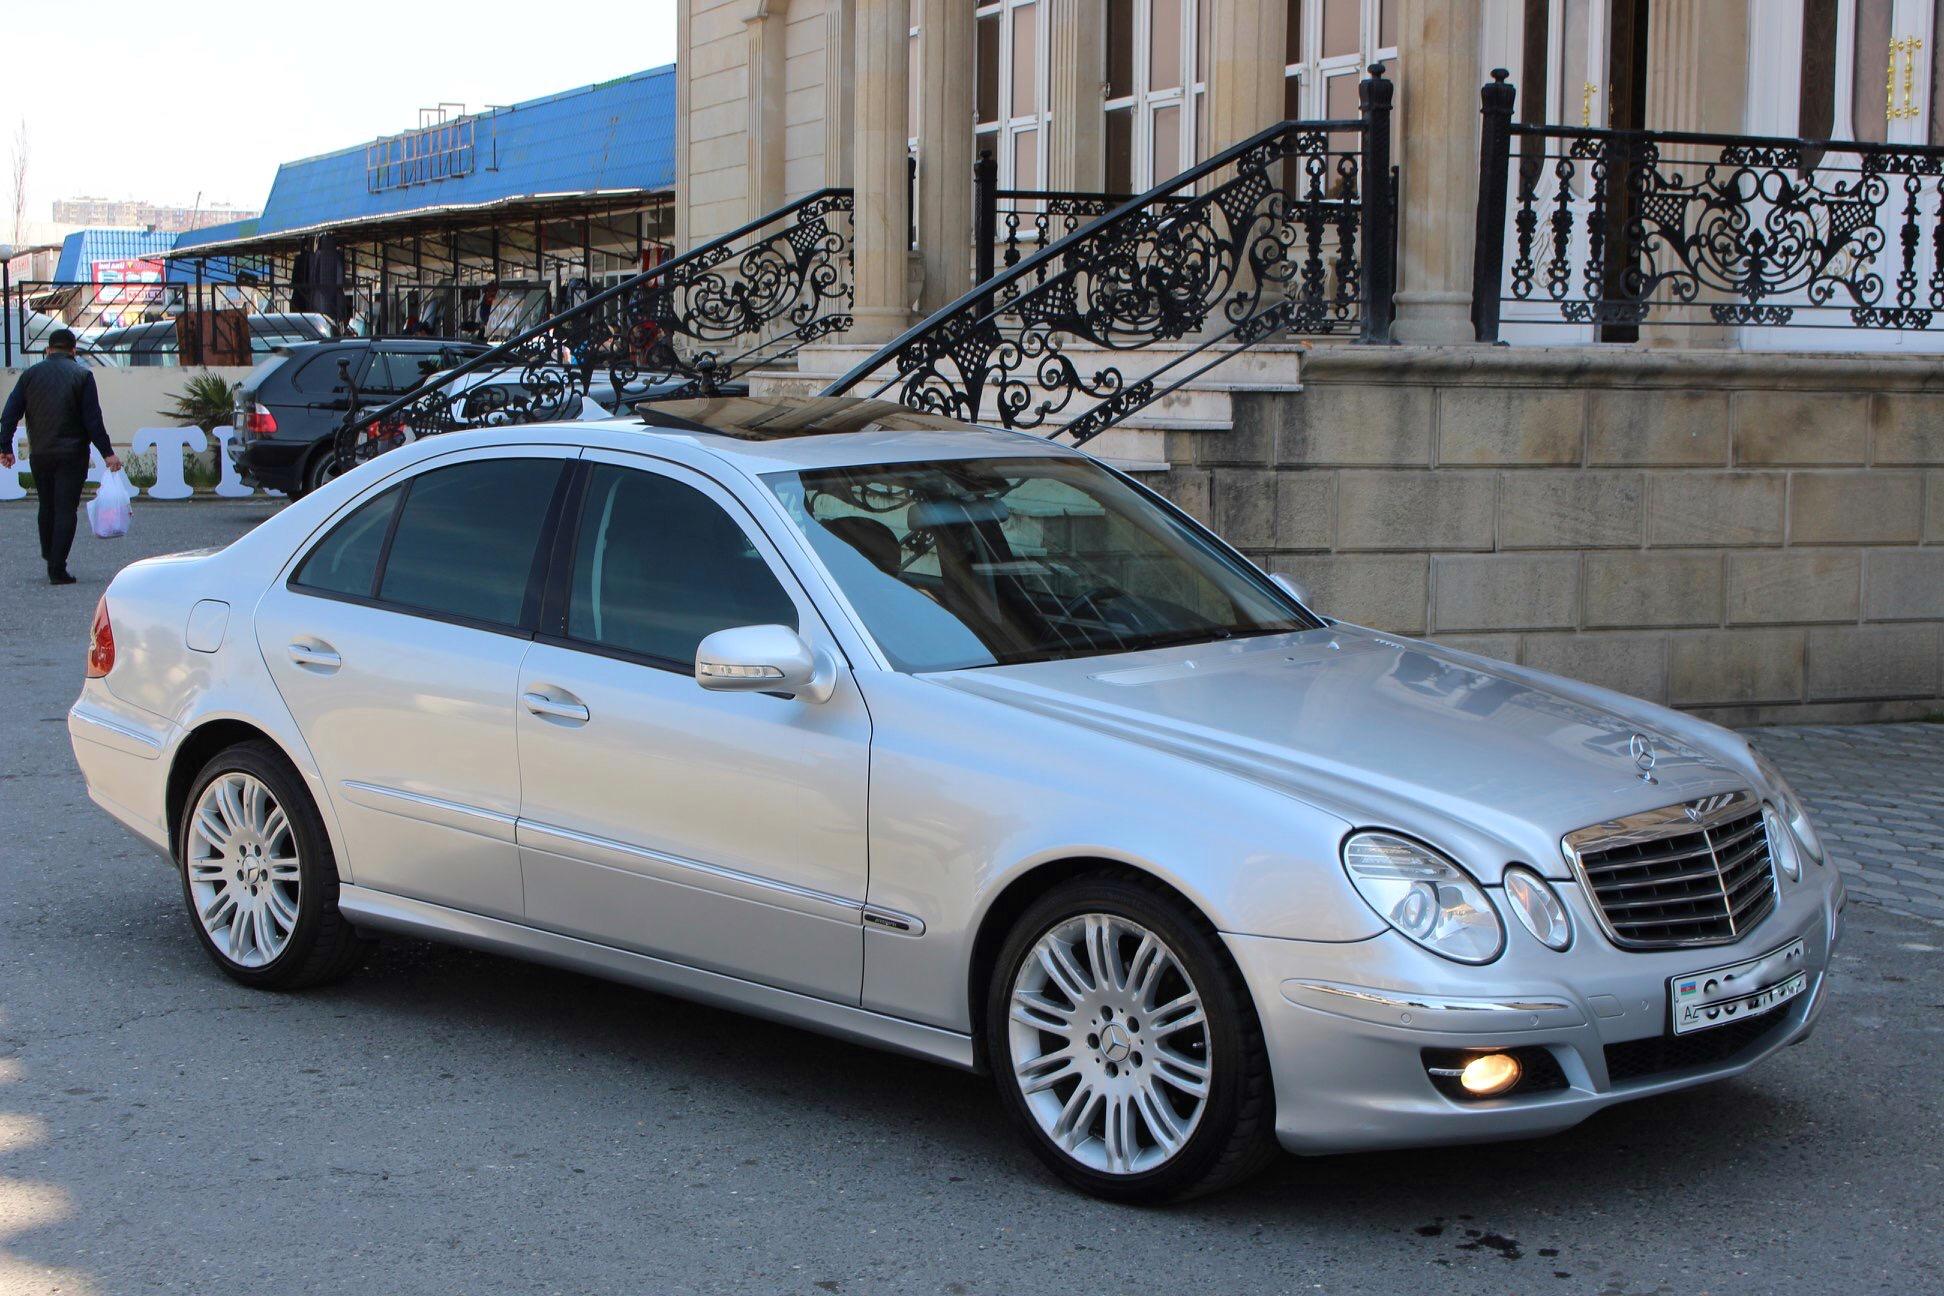 Mercedes-Benz E 220 2.2(lt) 2007 İkinci əl  $13200